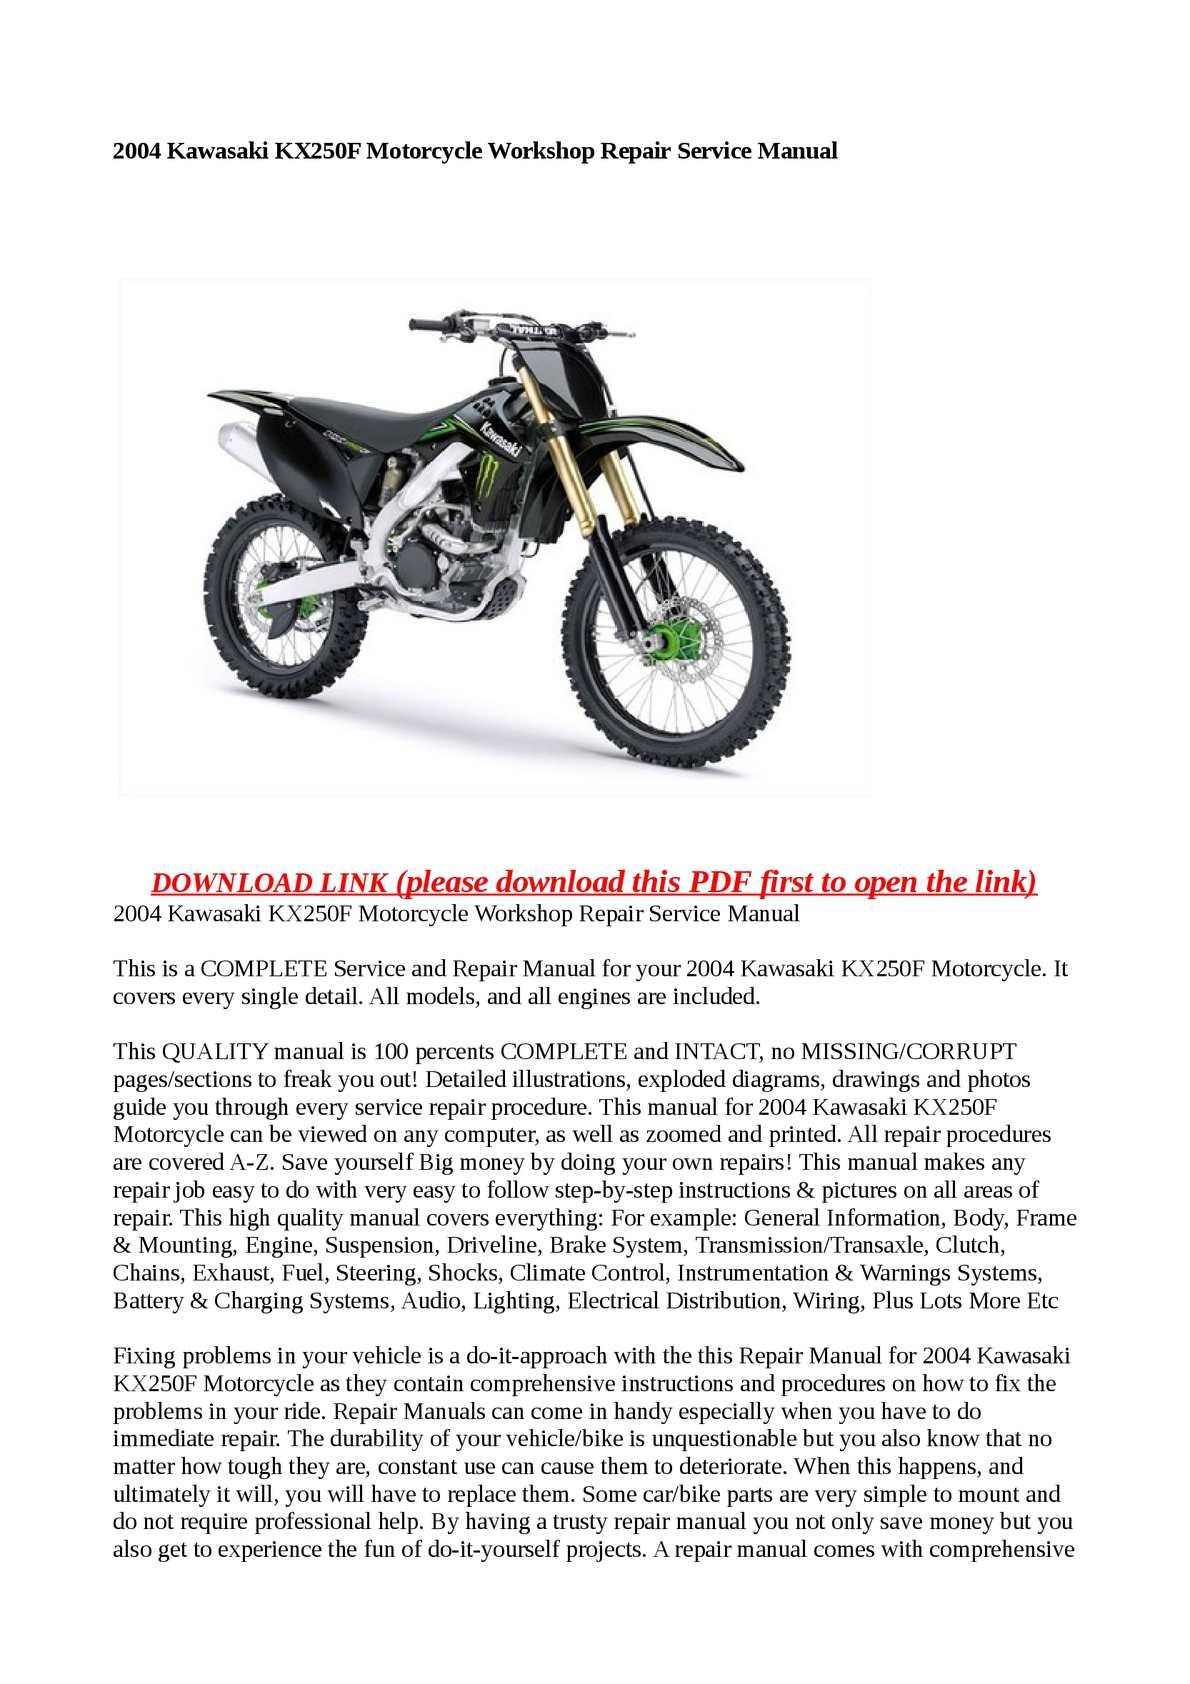 calam o 2004 kawasaki kx250f motorcycle workshop repair service manual rh  calameo com 2004 kx250f service manual free download 2004 kawasaki kx250f  repair ...